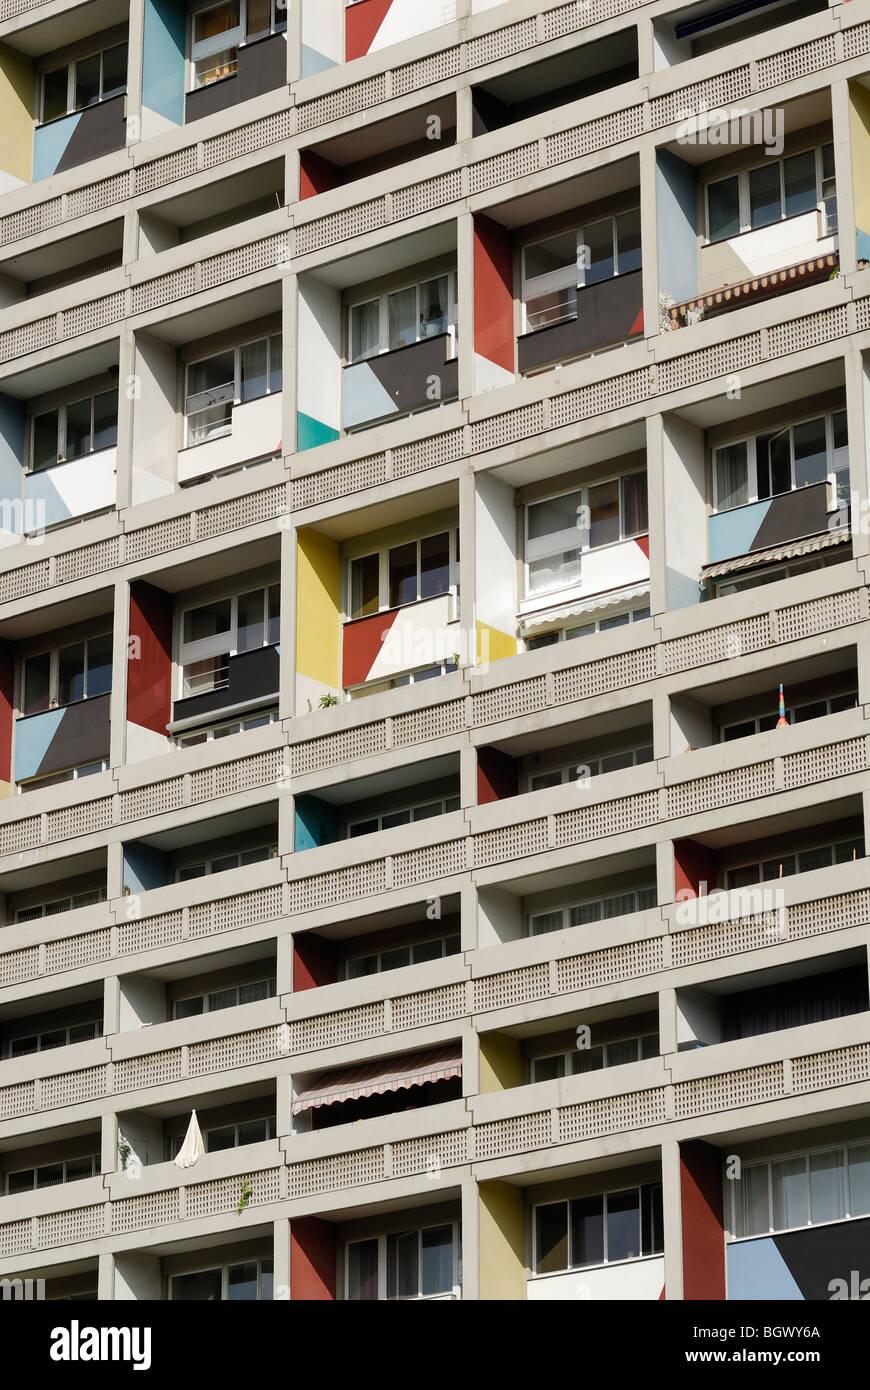 Berlin. Germany. Corbusier's Unite d'habitation. - Stock Image